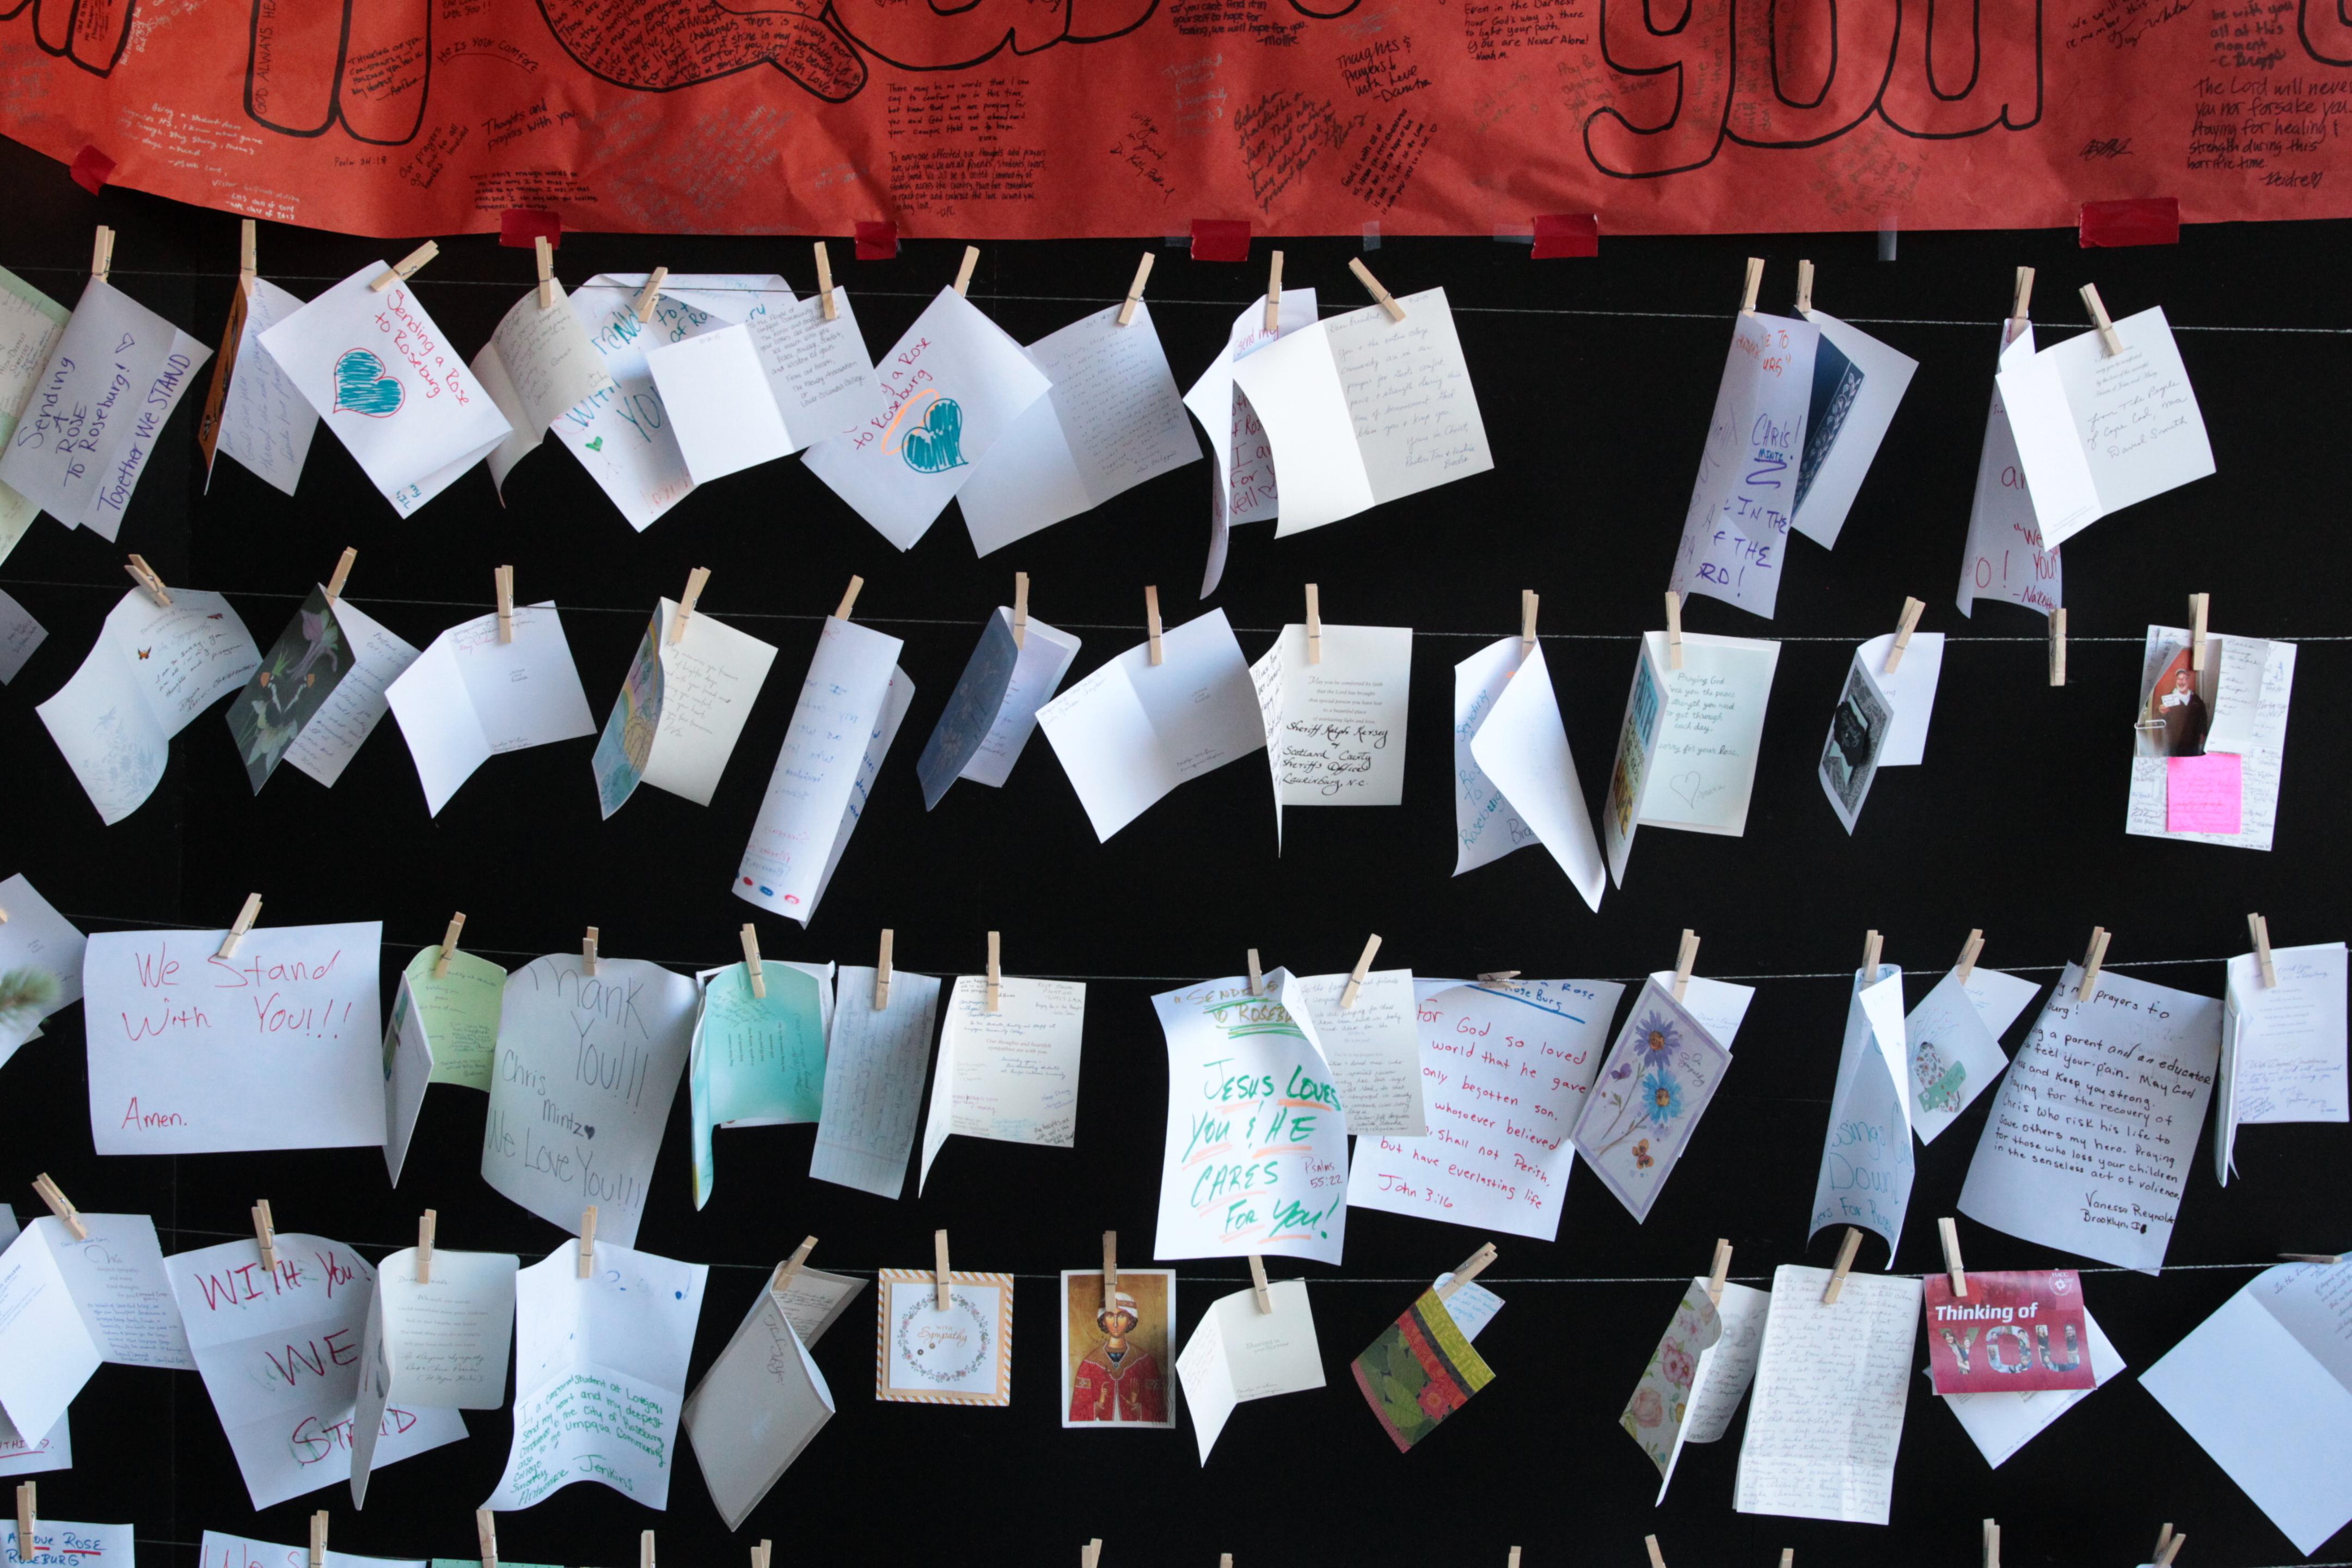 Cards hang at Umpqua Community College, Monday, Oct. 12, 2015, in Roseburg, Oregon. (Beth Nakamura/The Oregonian via AP, Pool)